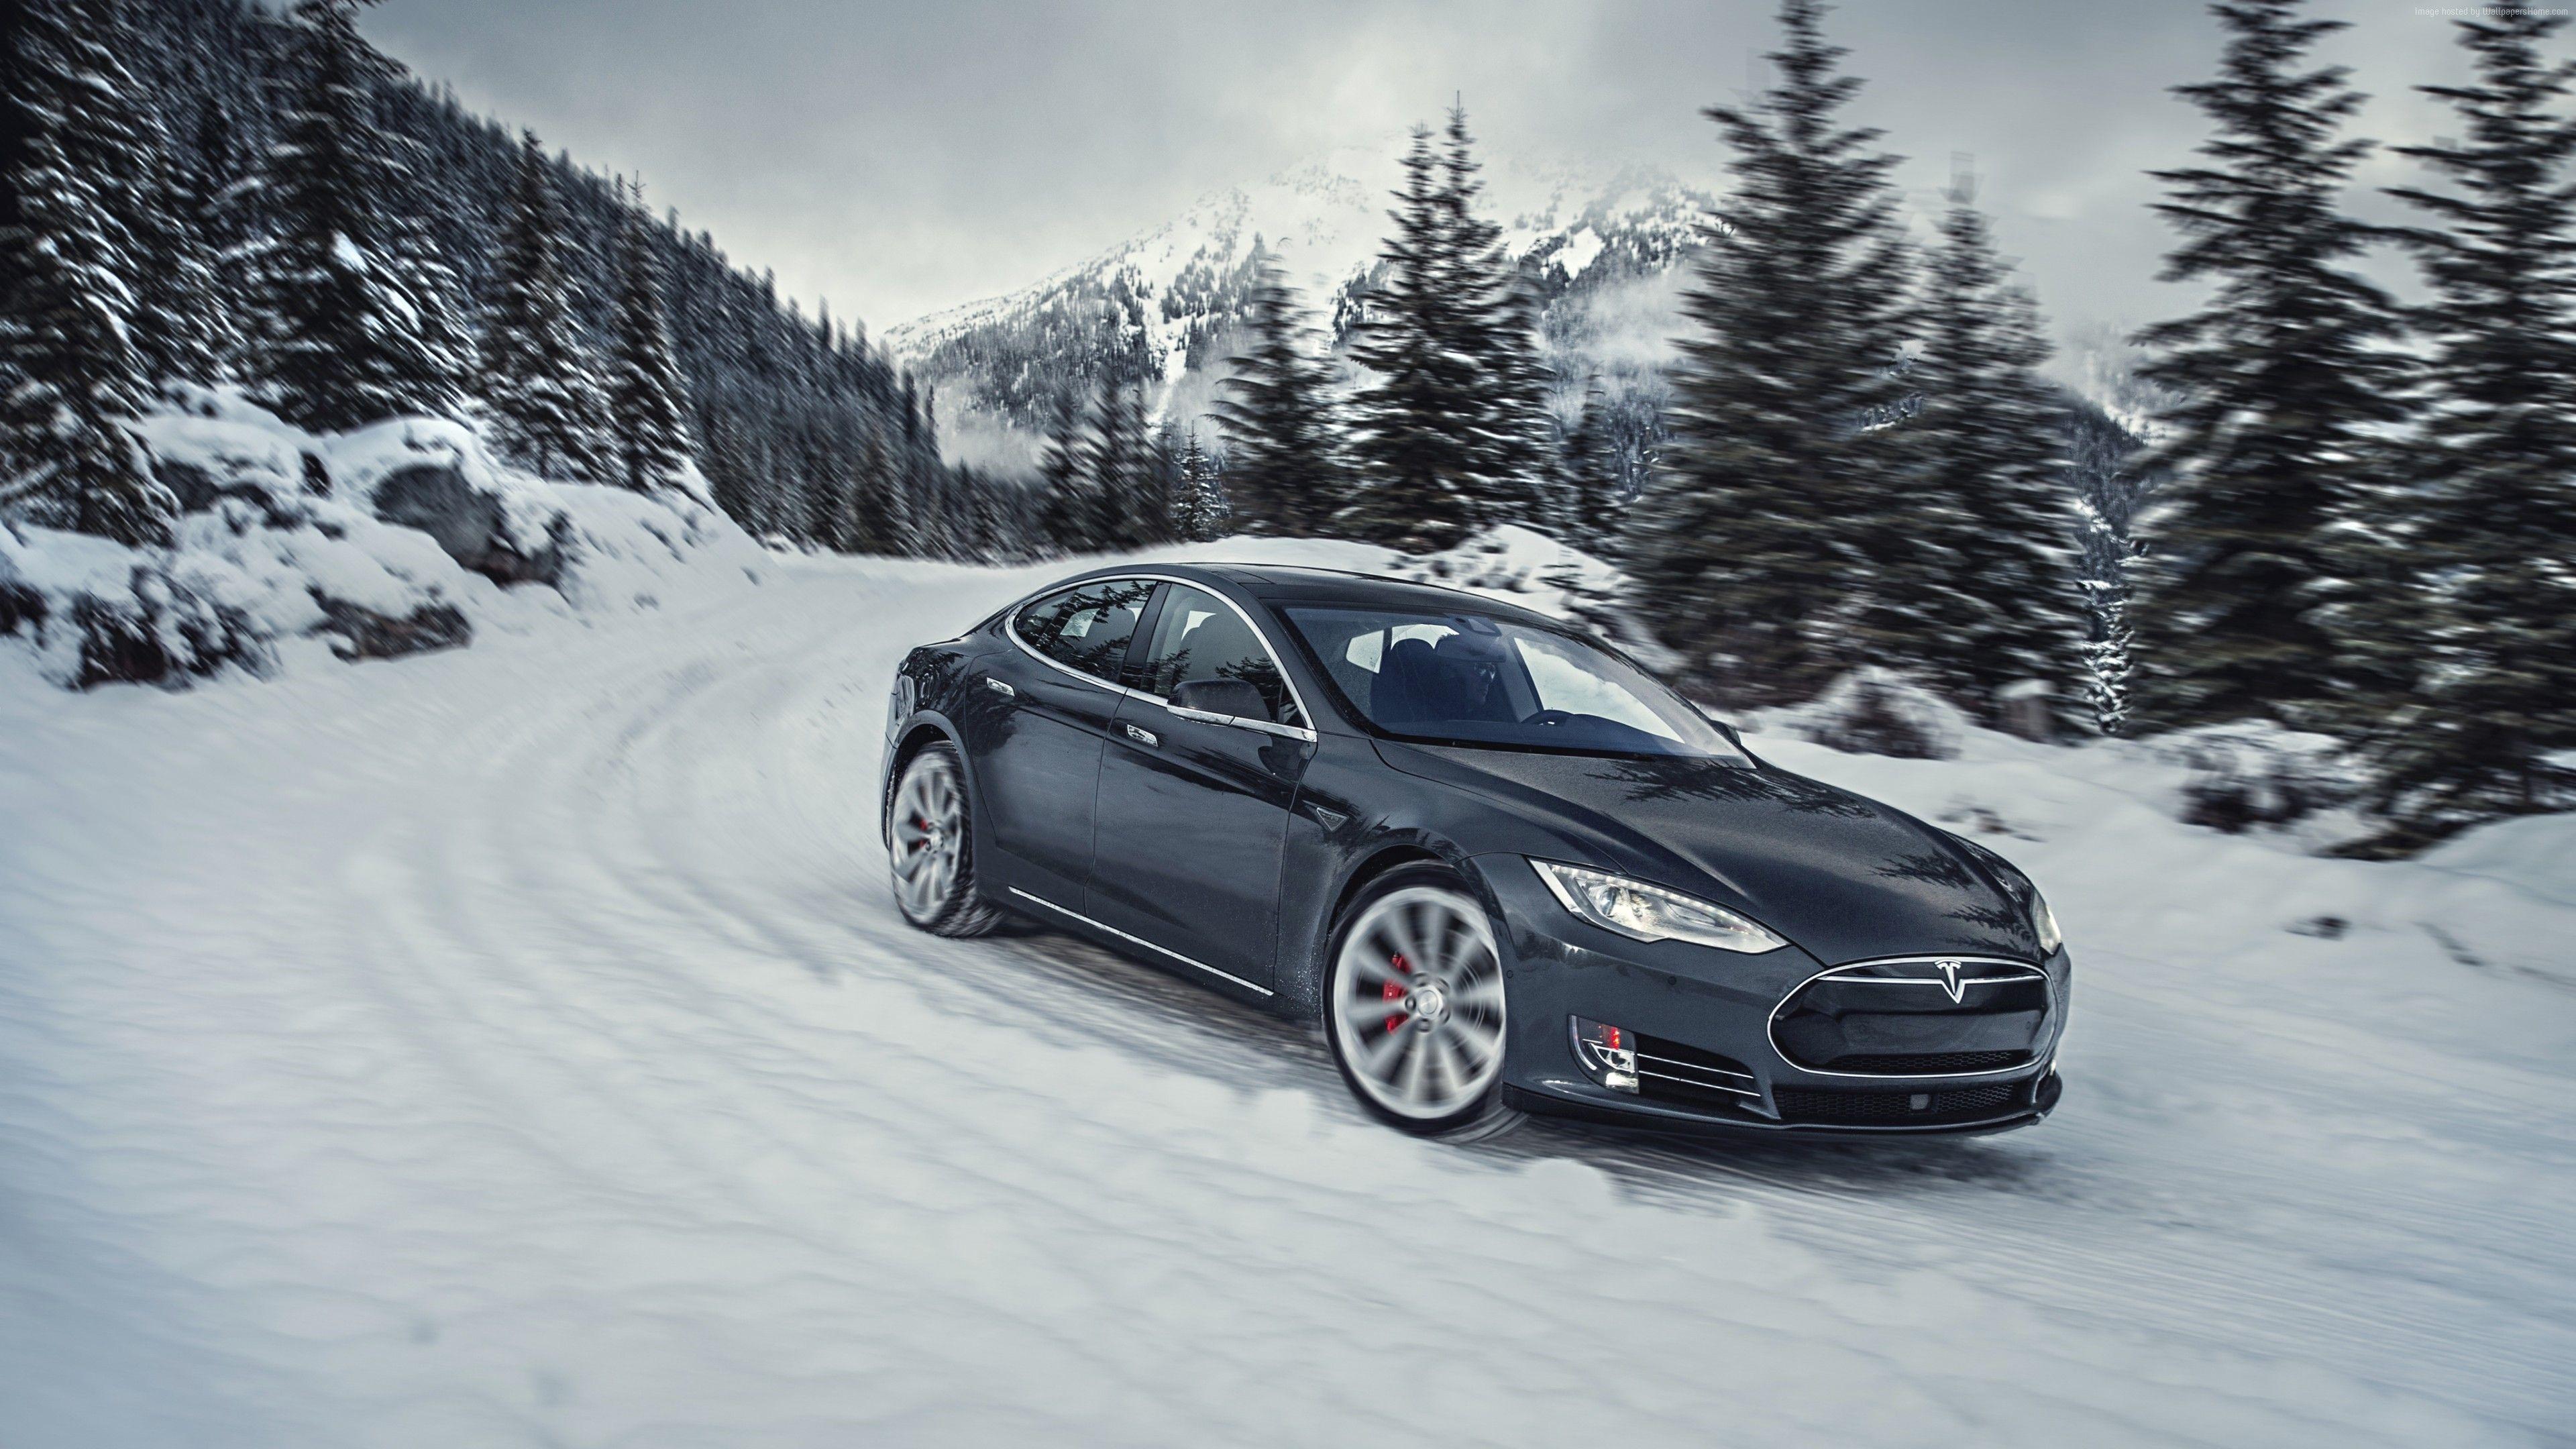 Tesla hd wallpapers